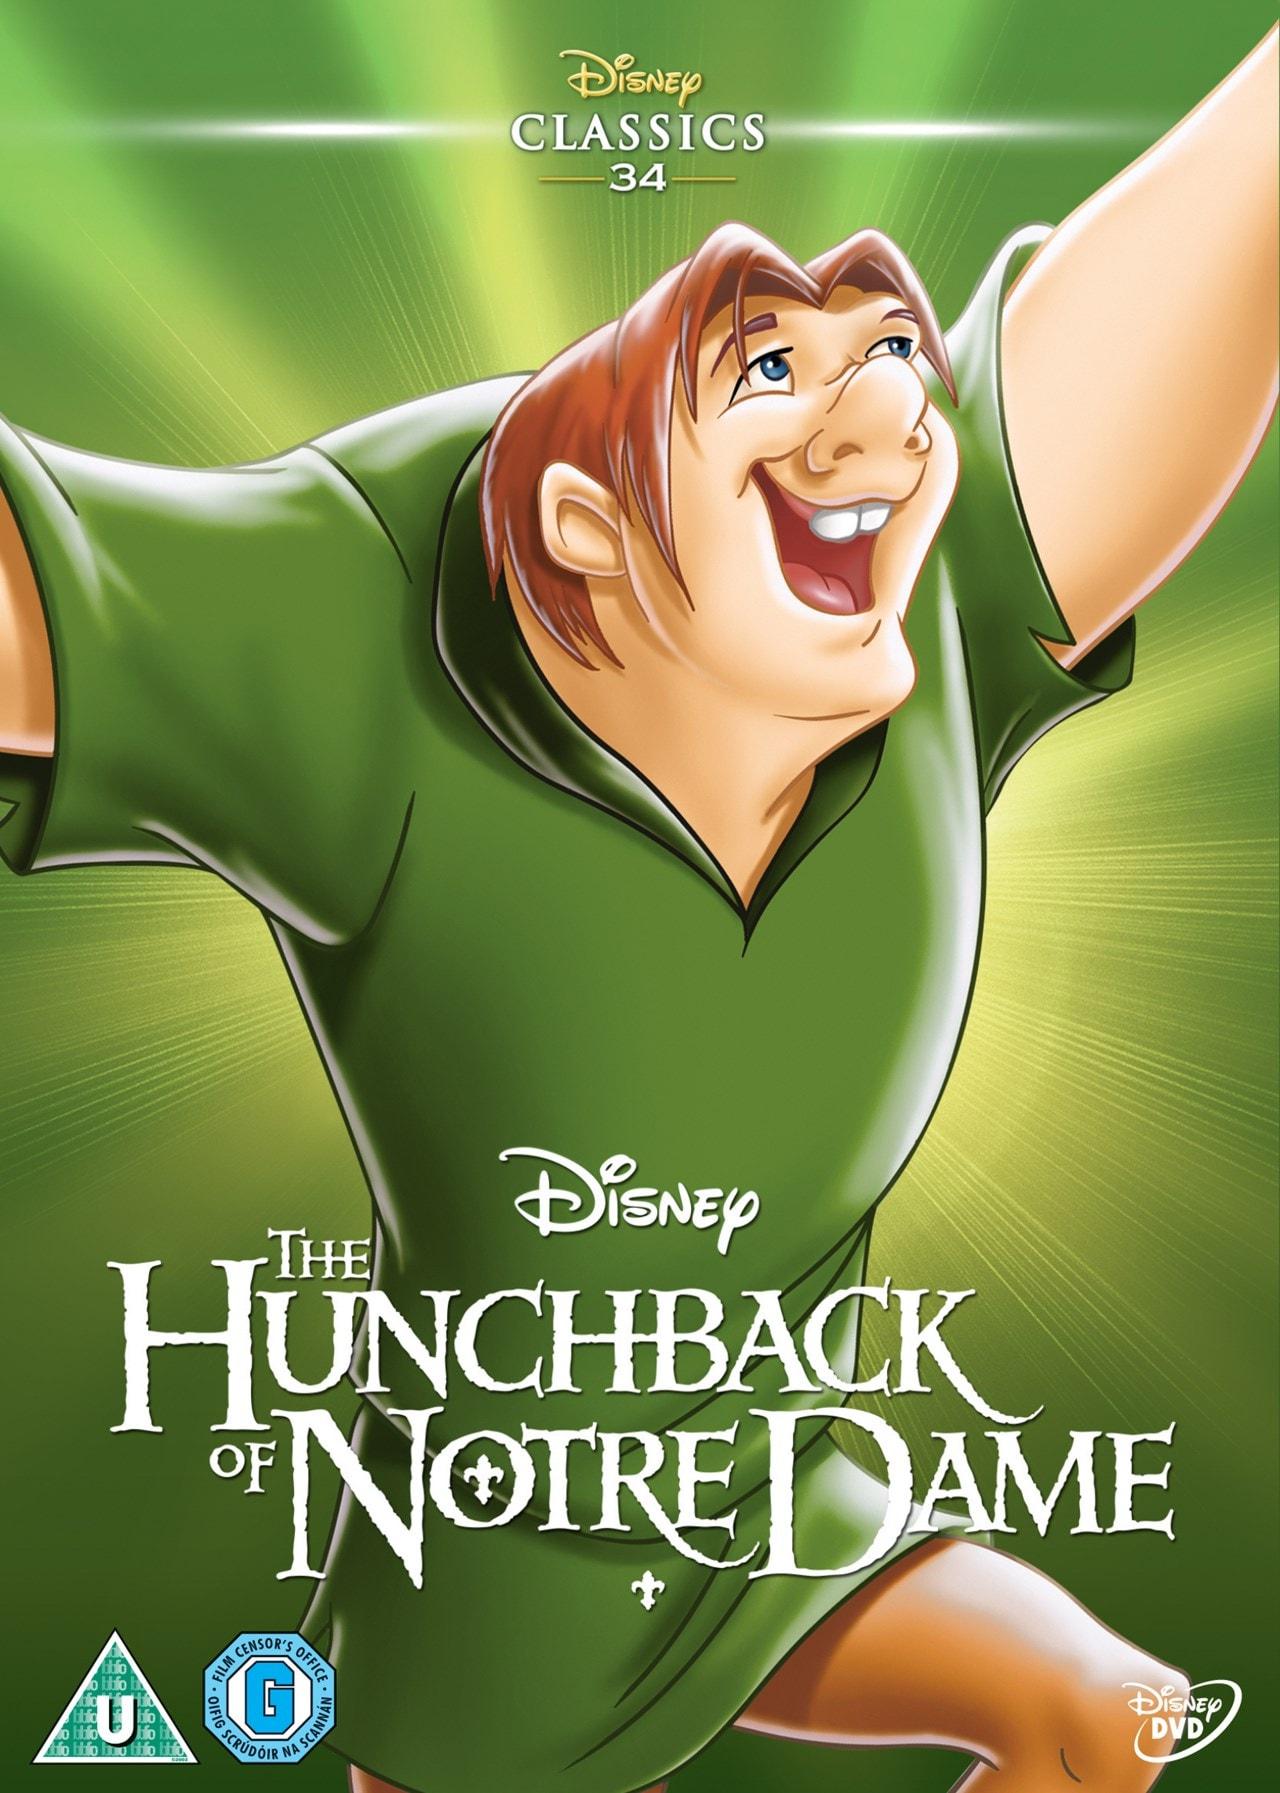 The Hunchback of Notre Dame (Disney) - 1